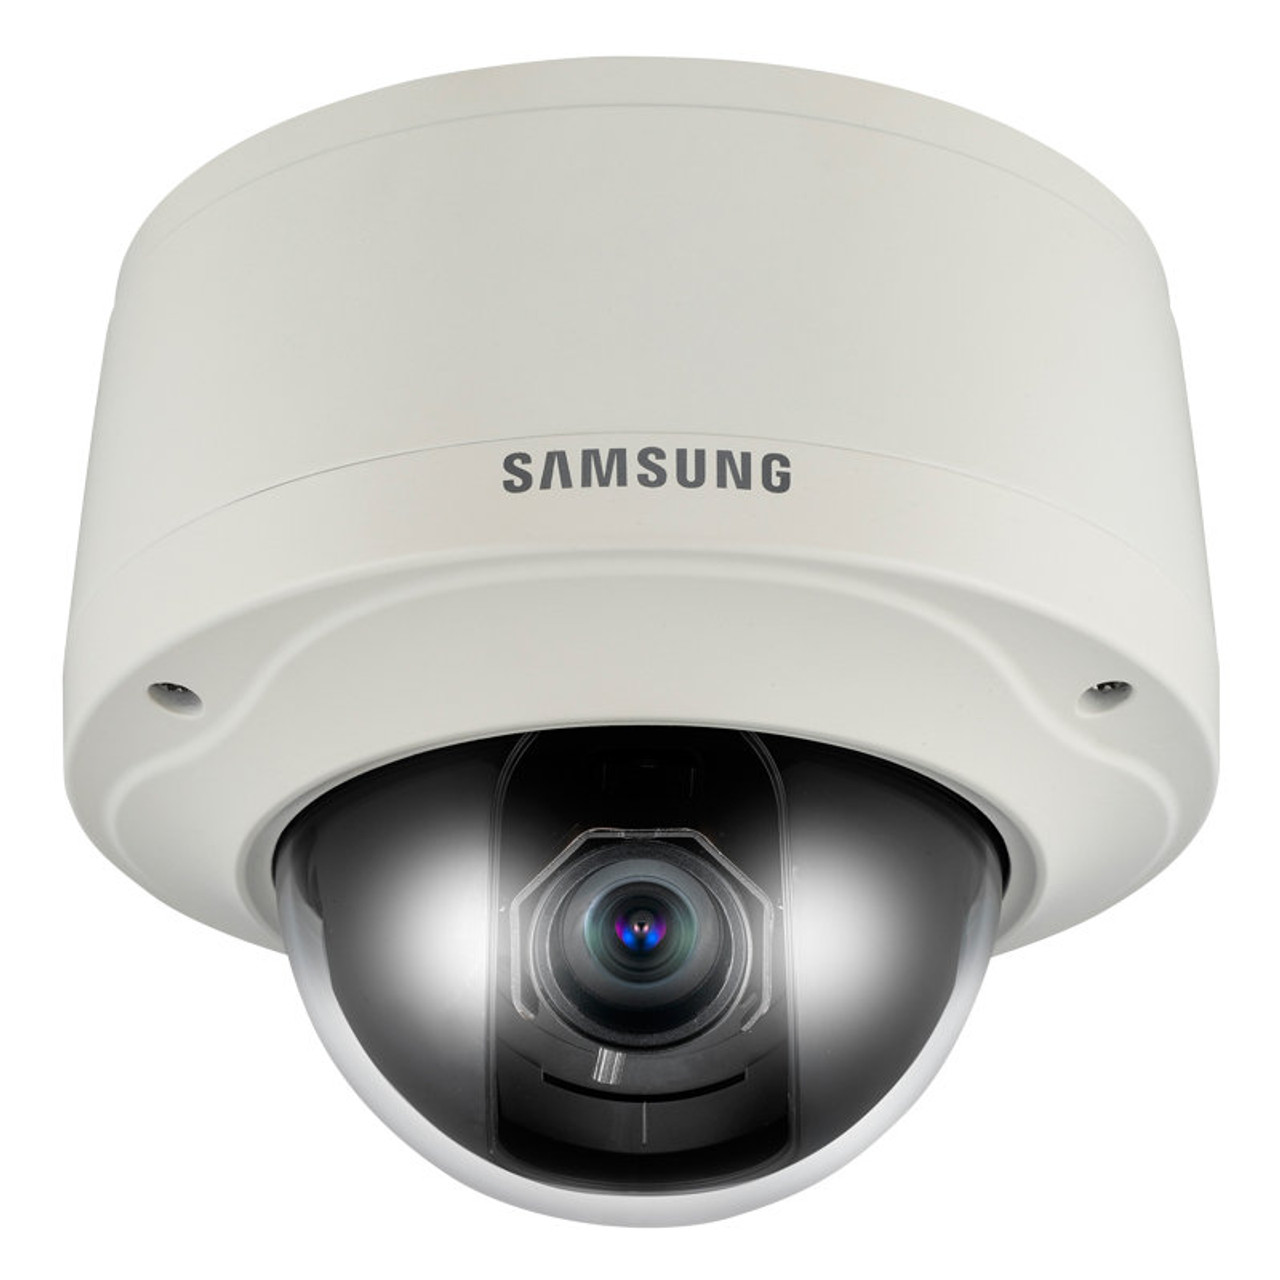 SAMSUNG SND-5080 NETWORK CAMERA WINDOWS 8.1 DRIVERS DOWNLOAD